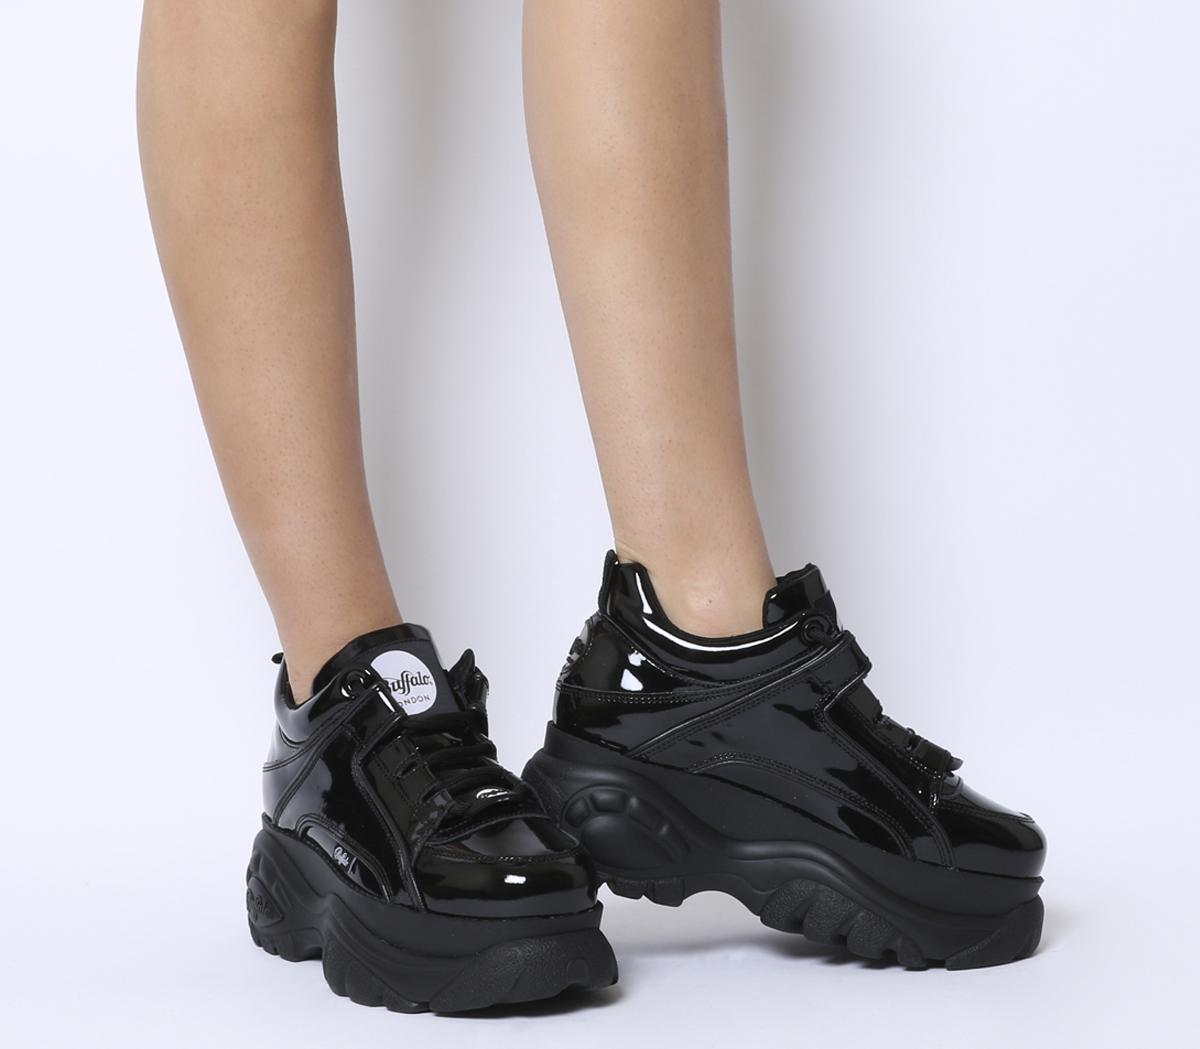 1339-14 2.0 Low Sneakers Black Patent